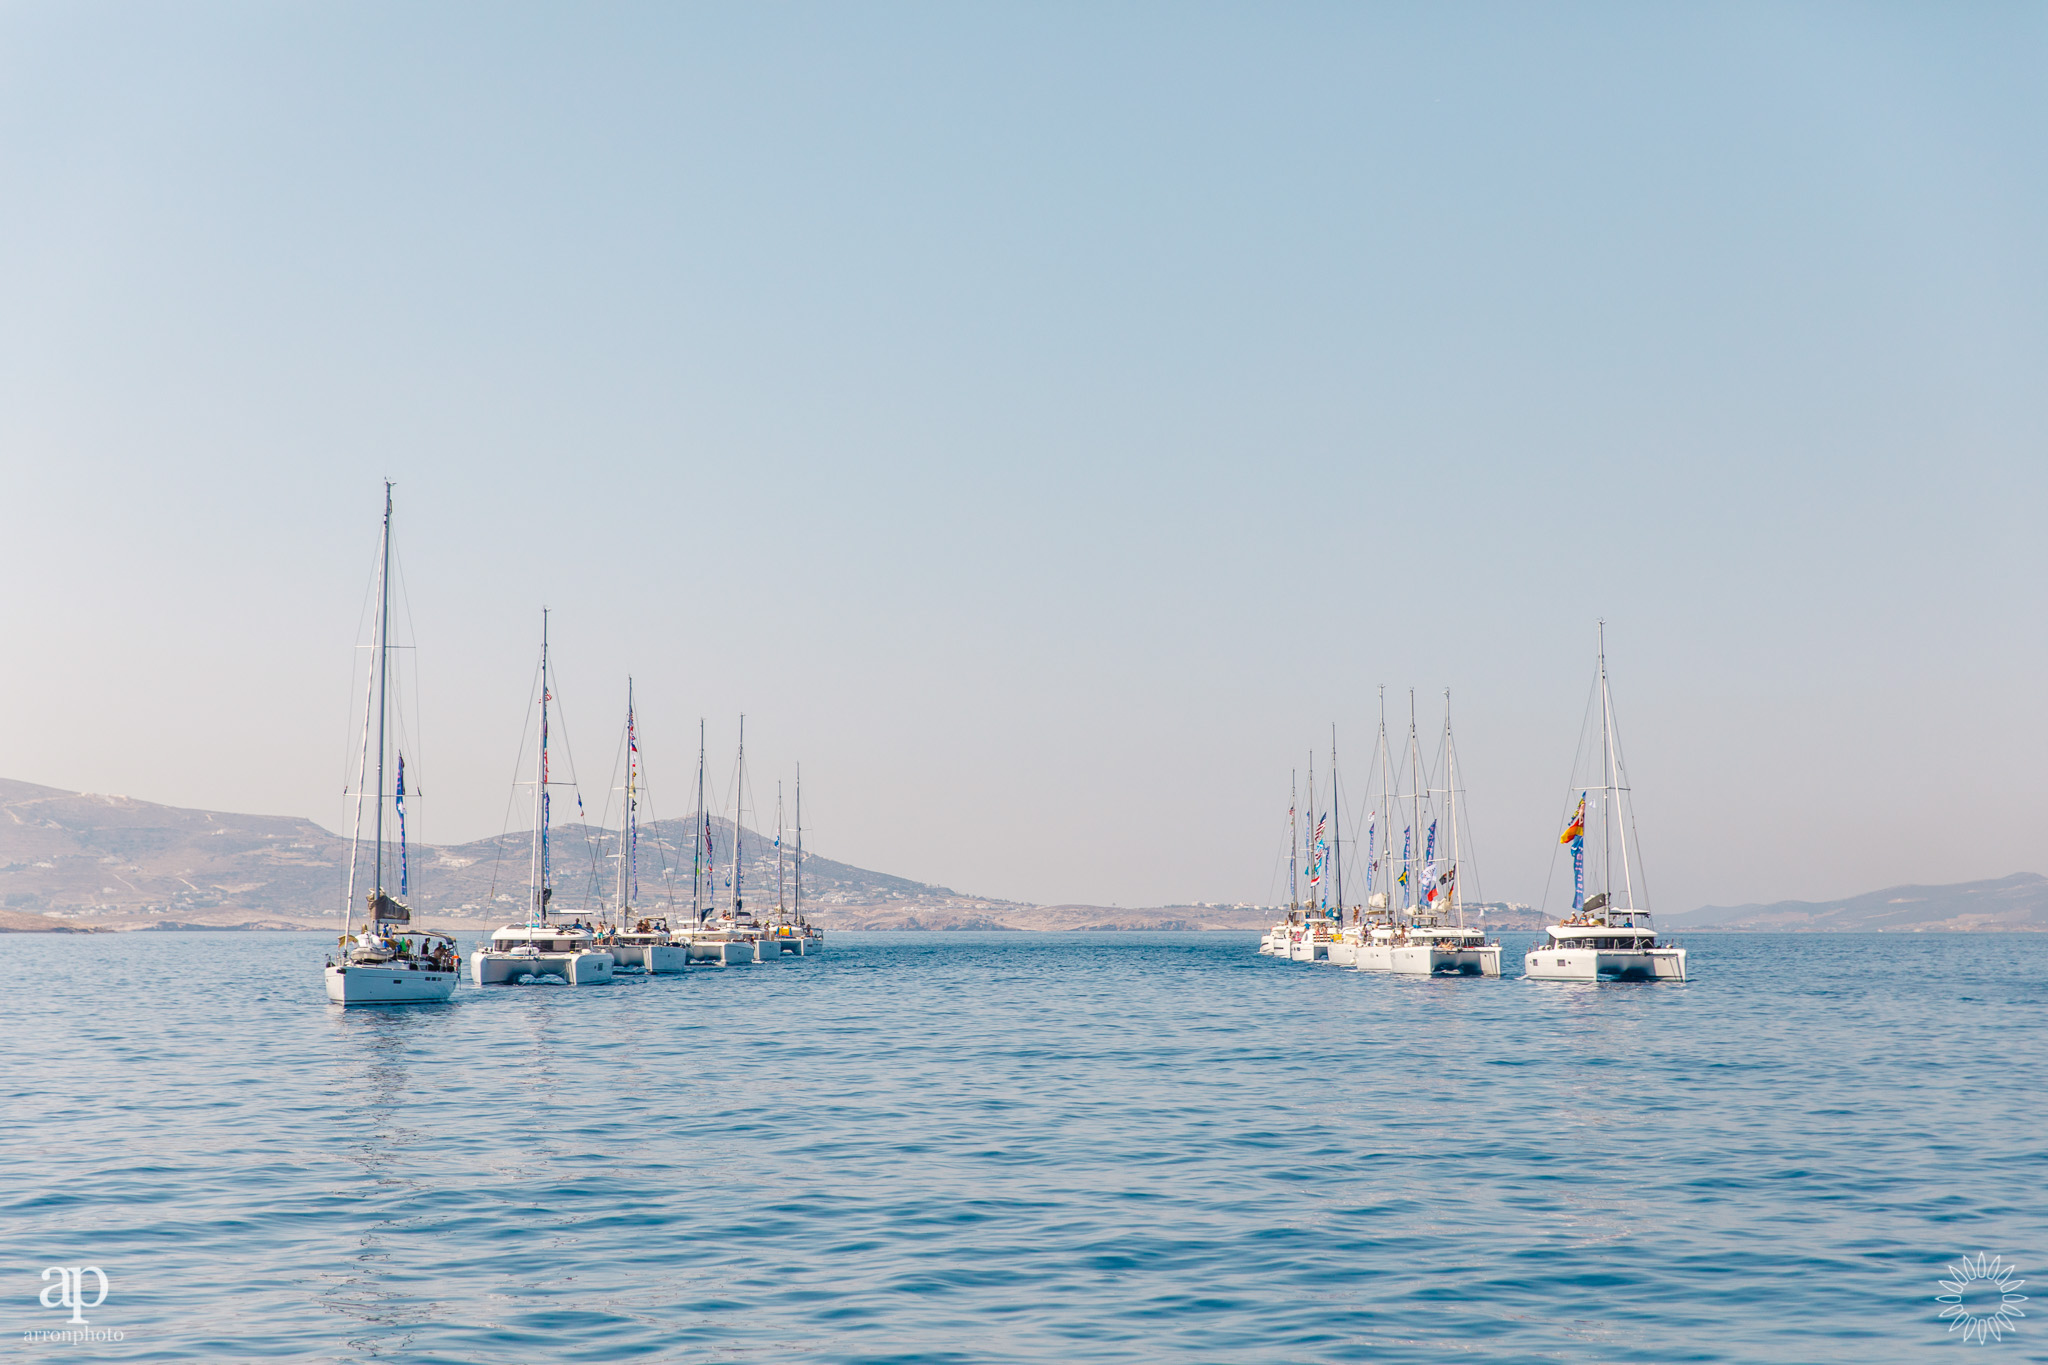 TBL Armada - The Mykonos Route